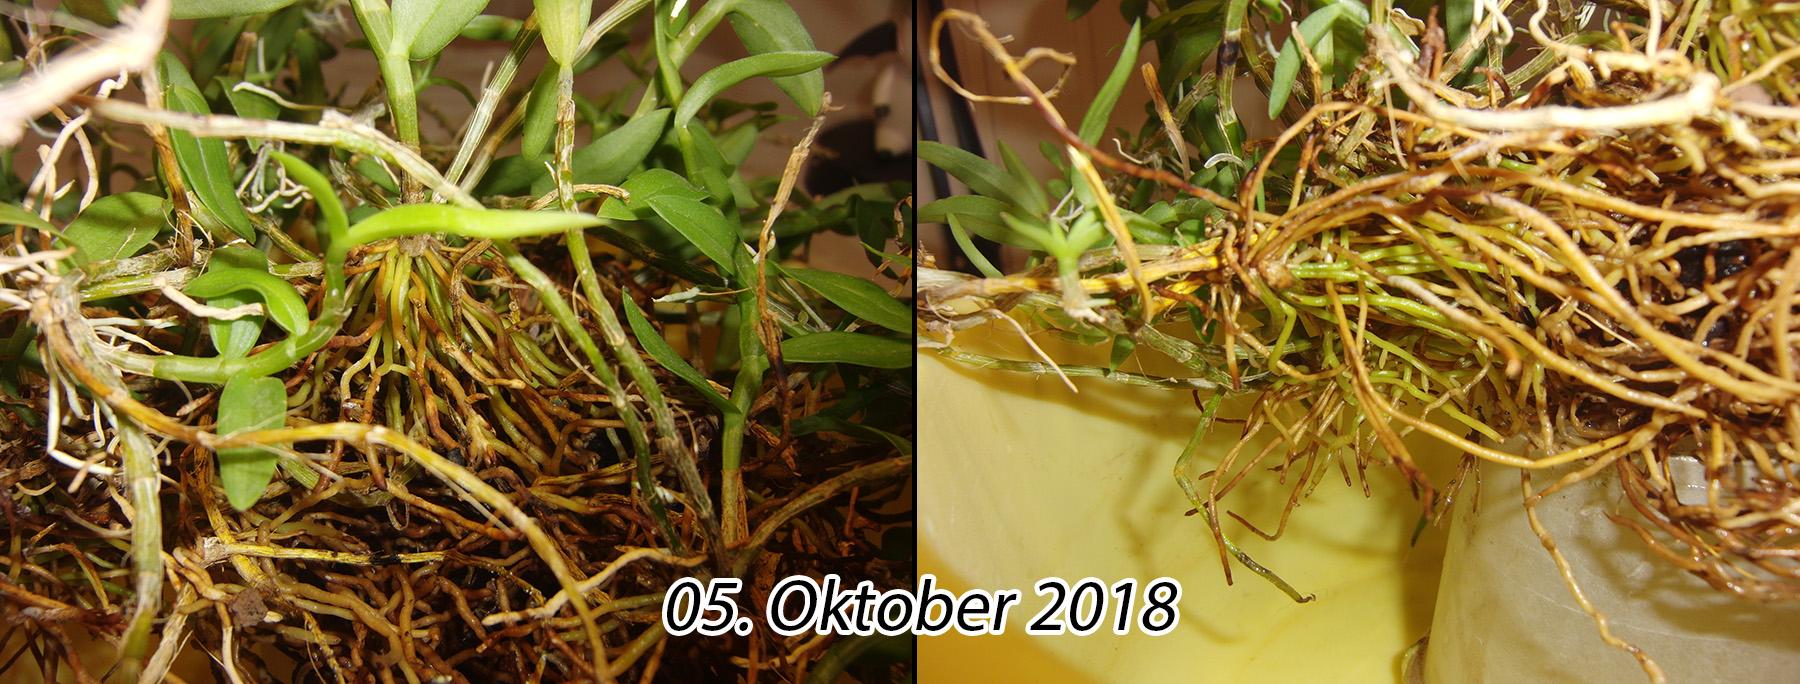 Dendrobium loddigesii 2018-10-05-loddigesii03